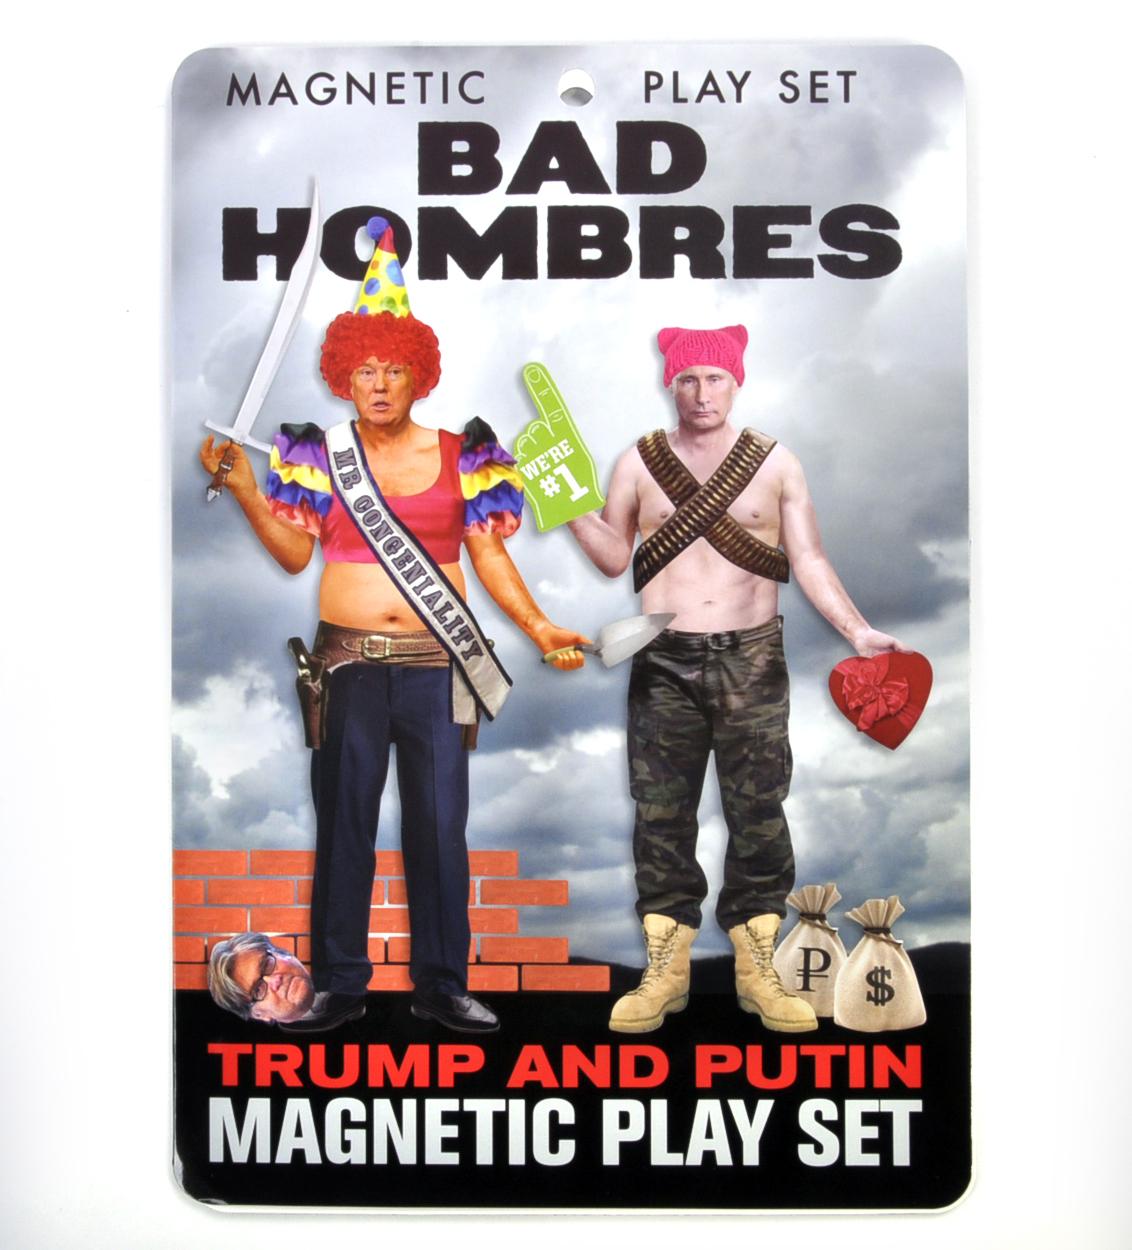 trump putin bad hombres magnetic play fridge magnet. Black Bedroom Furniture Sets. Home Design Ideas